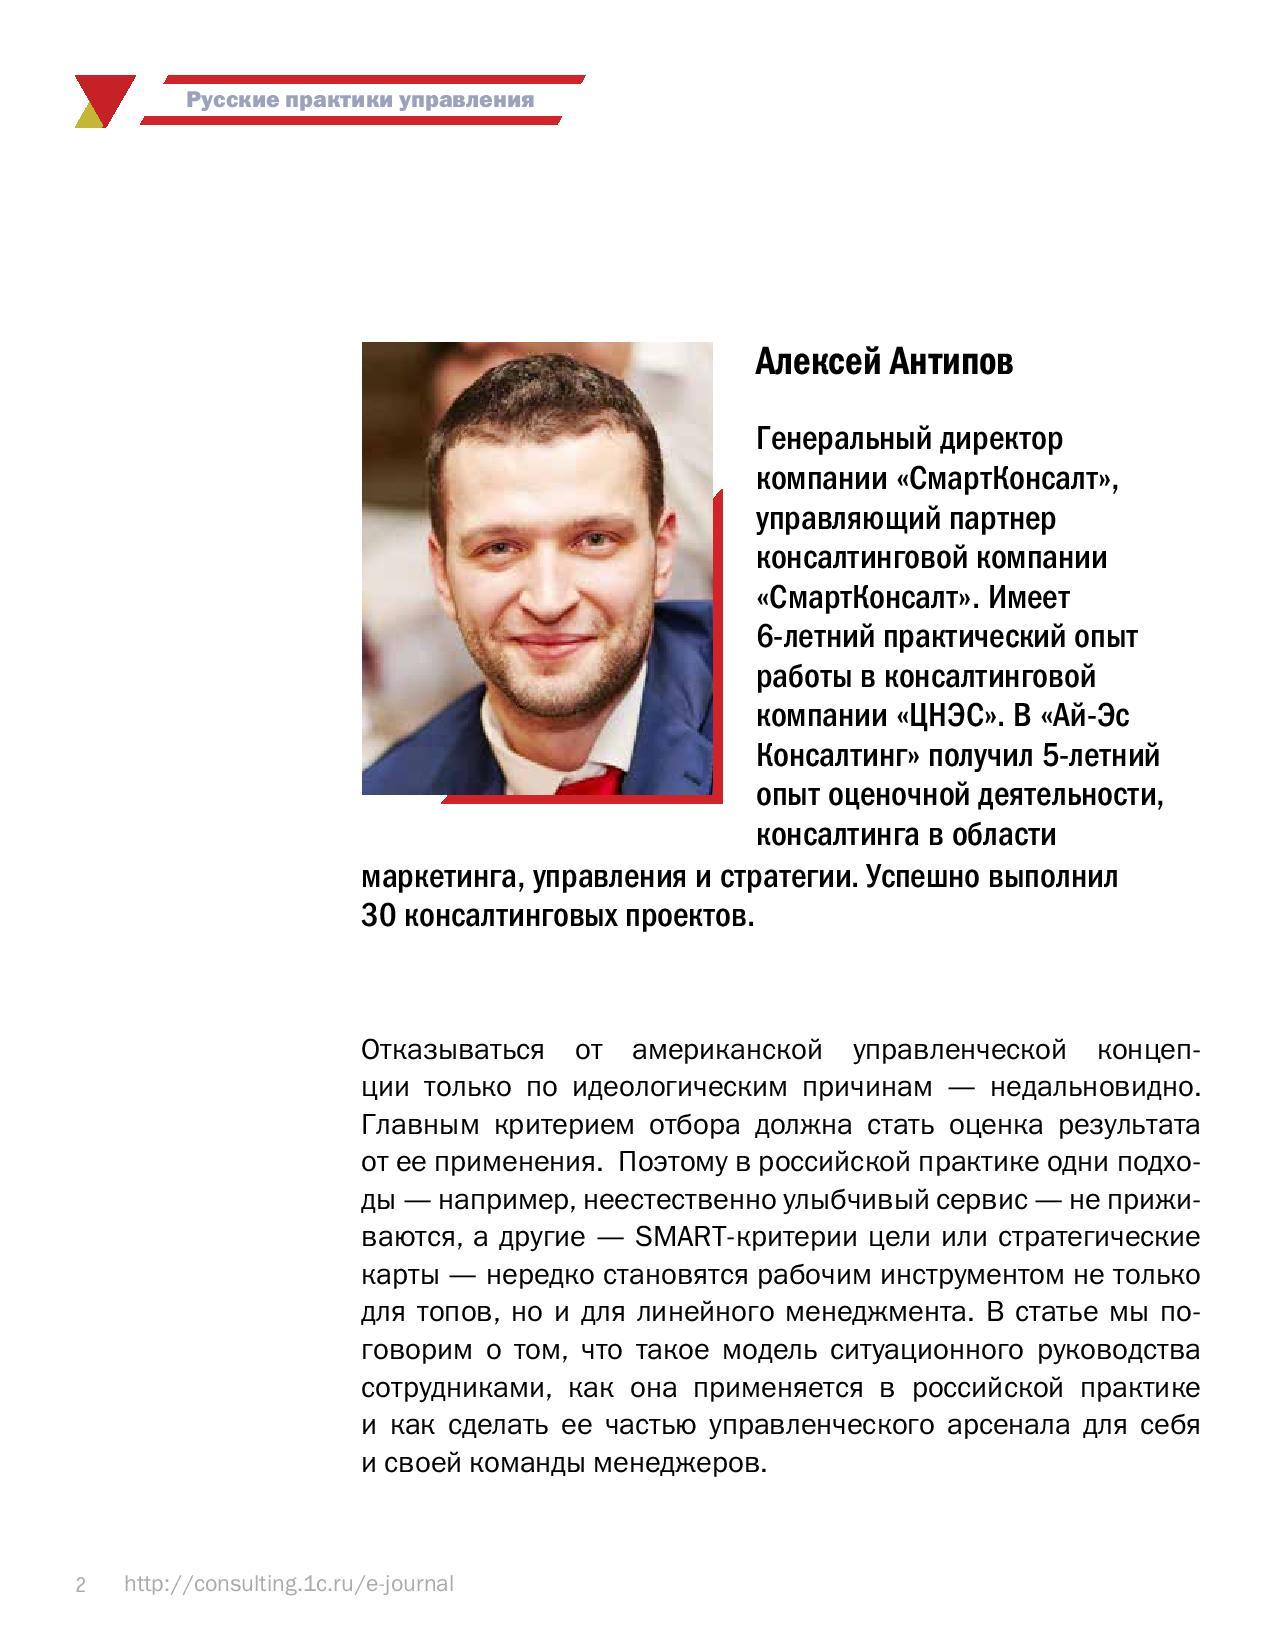 Situacionnyy_podhod_Cast__1._Upravlaem_predpriatiem__04_2015-page-002